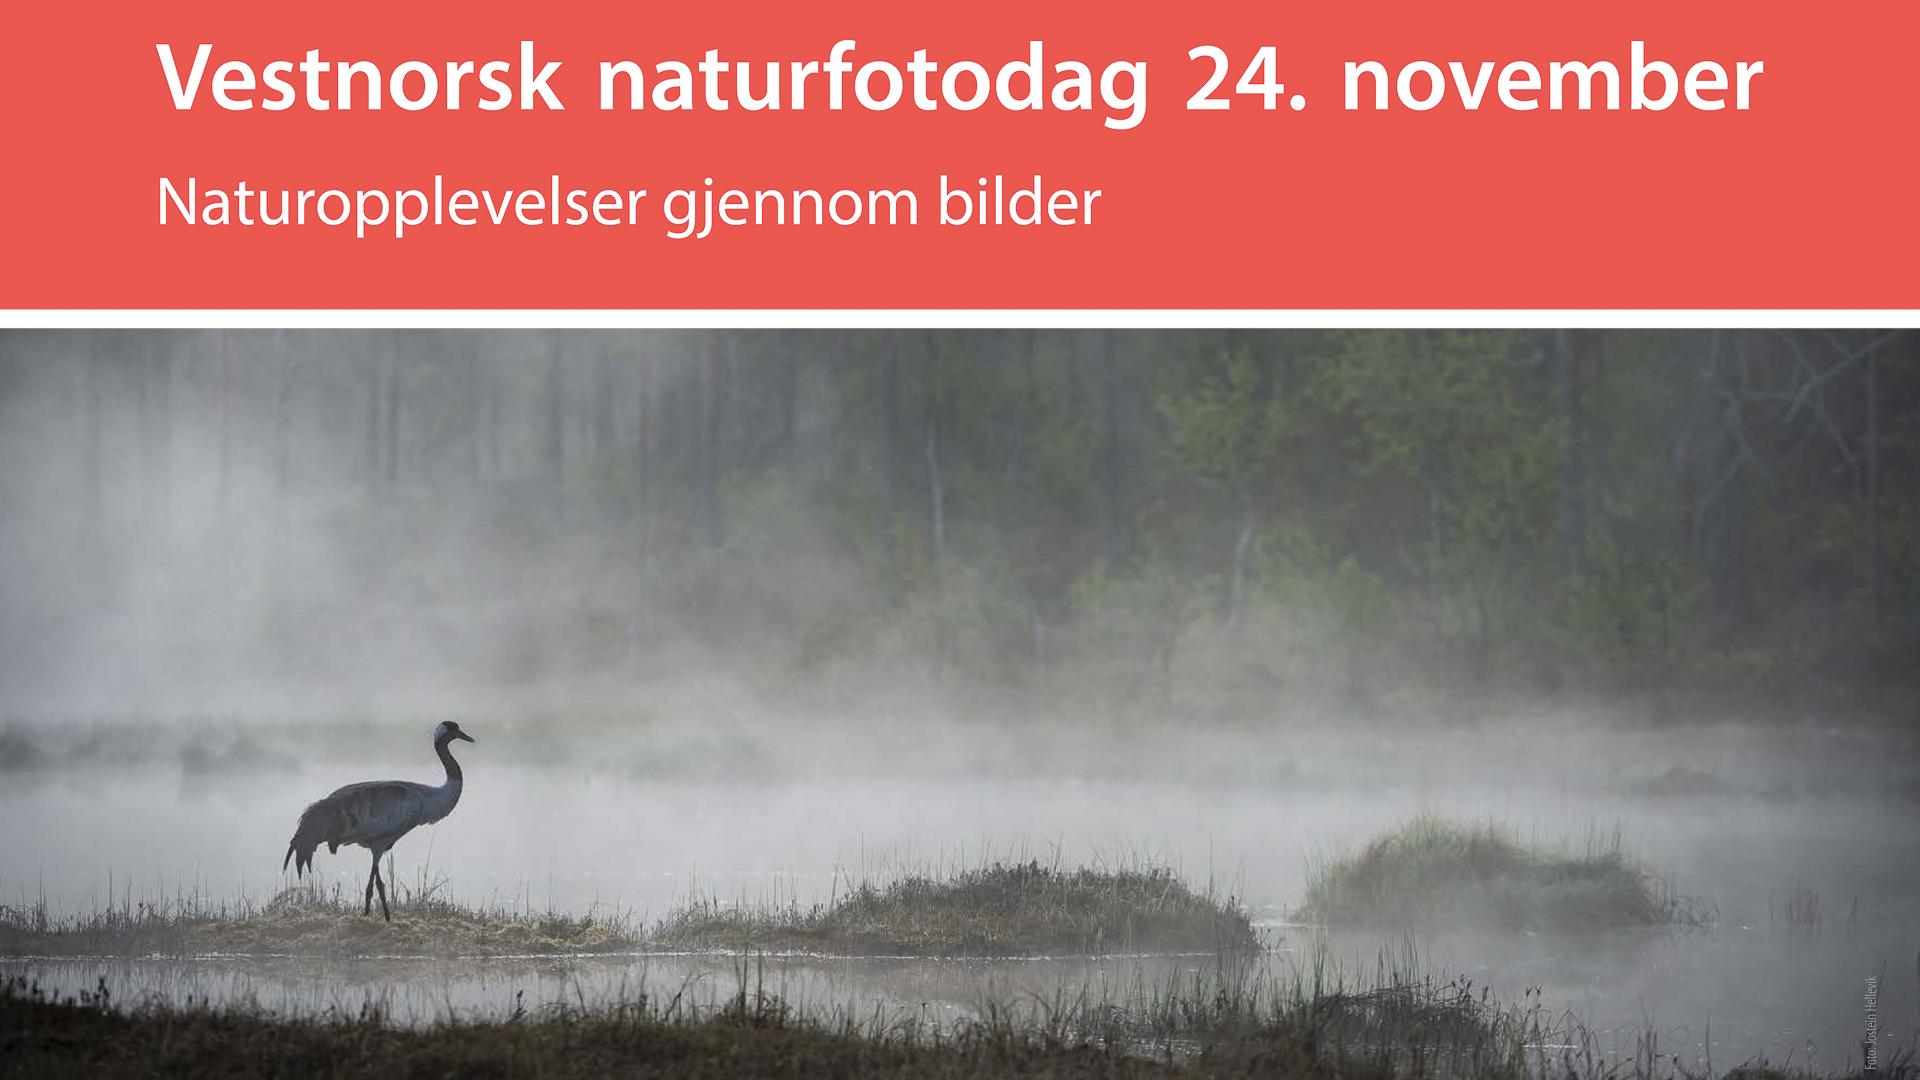 BioFoto Hordaland